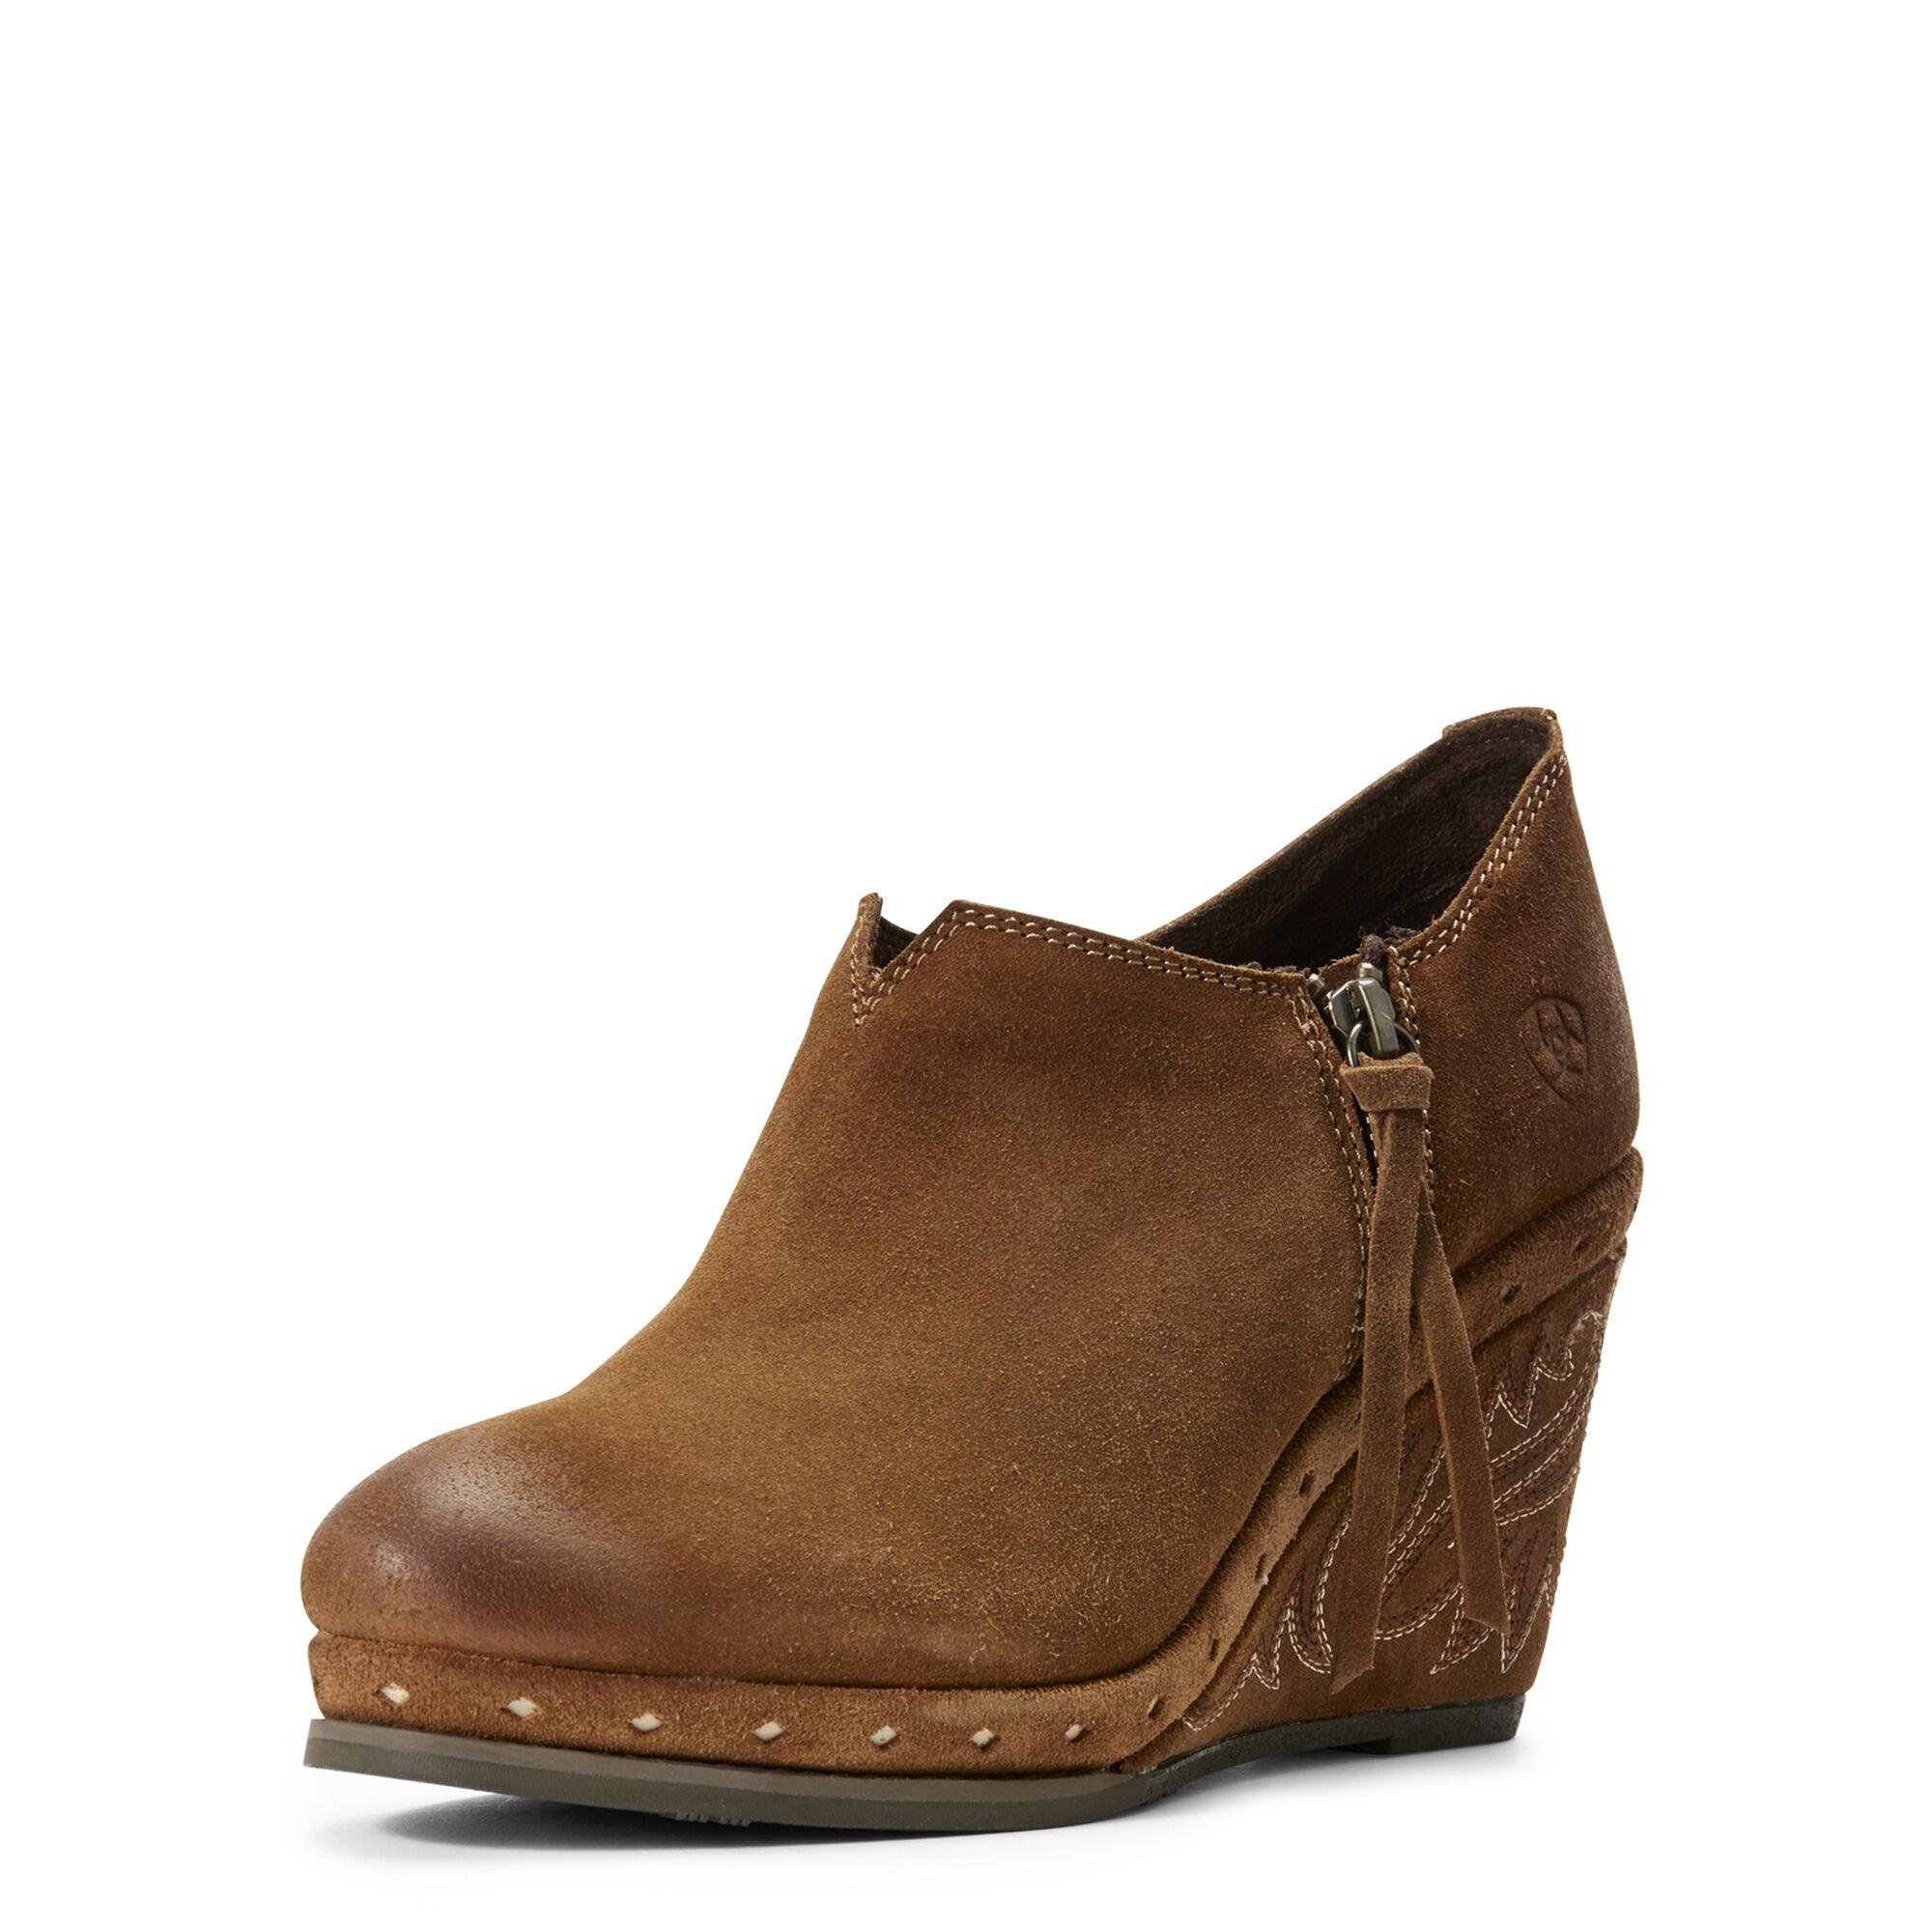 Briley Western Boot